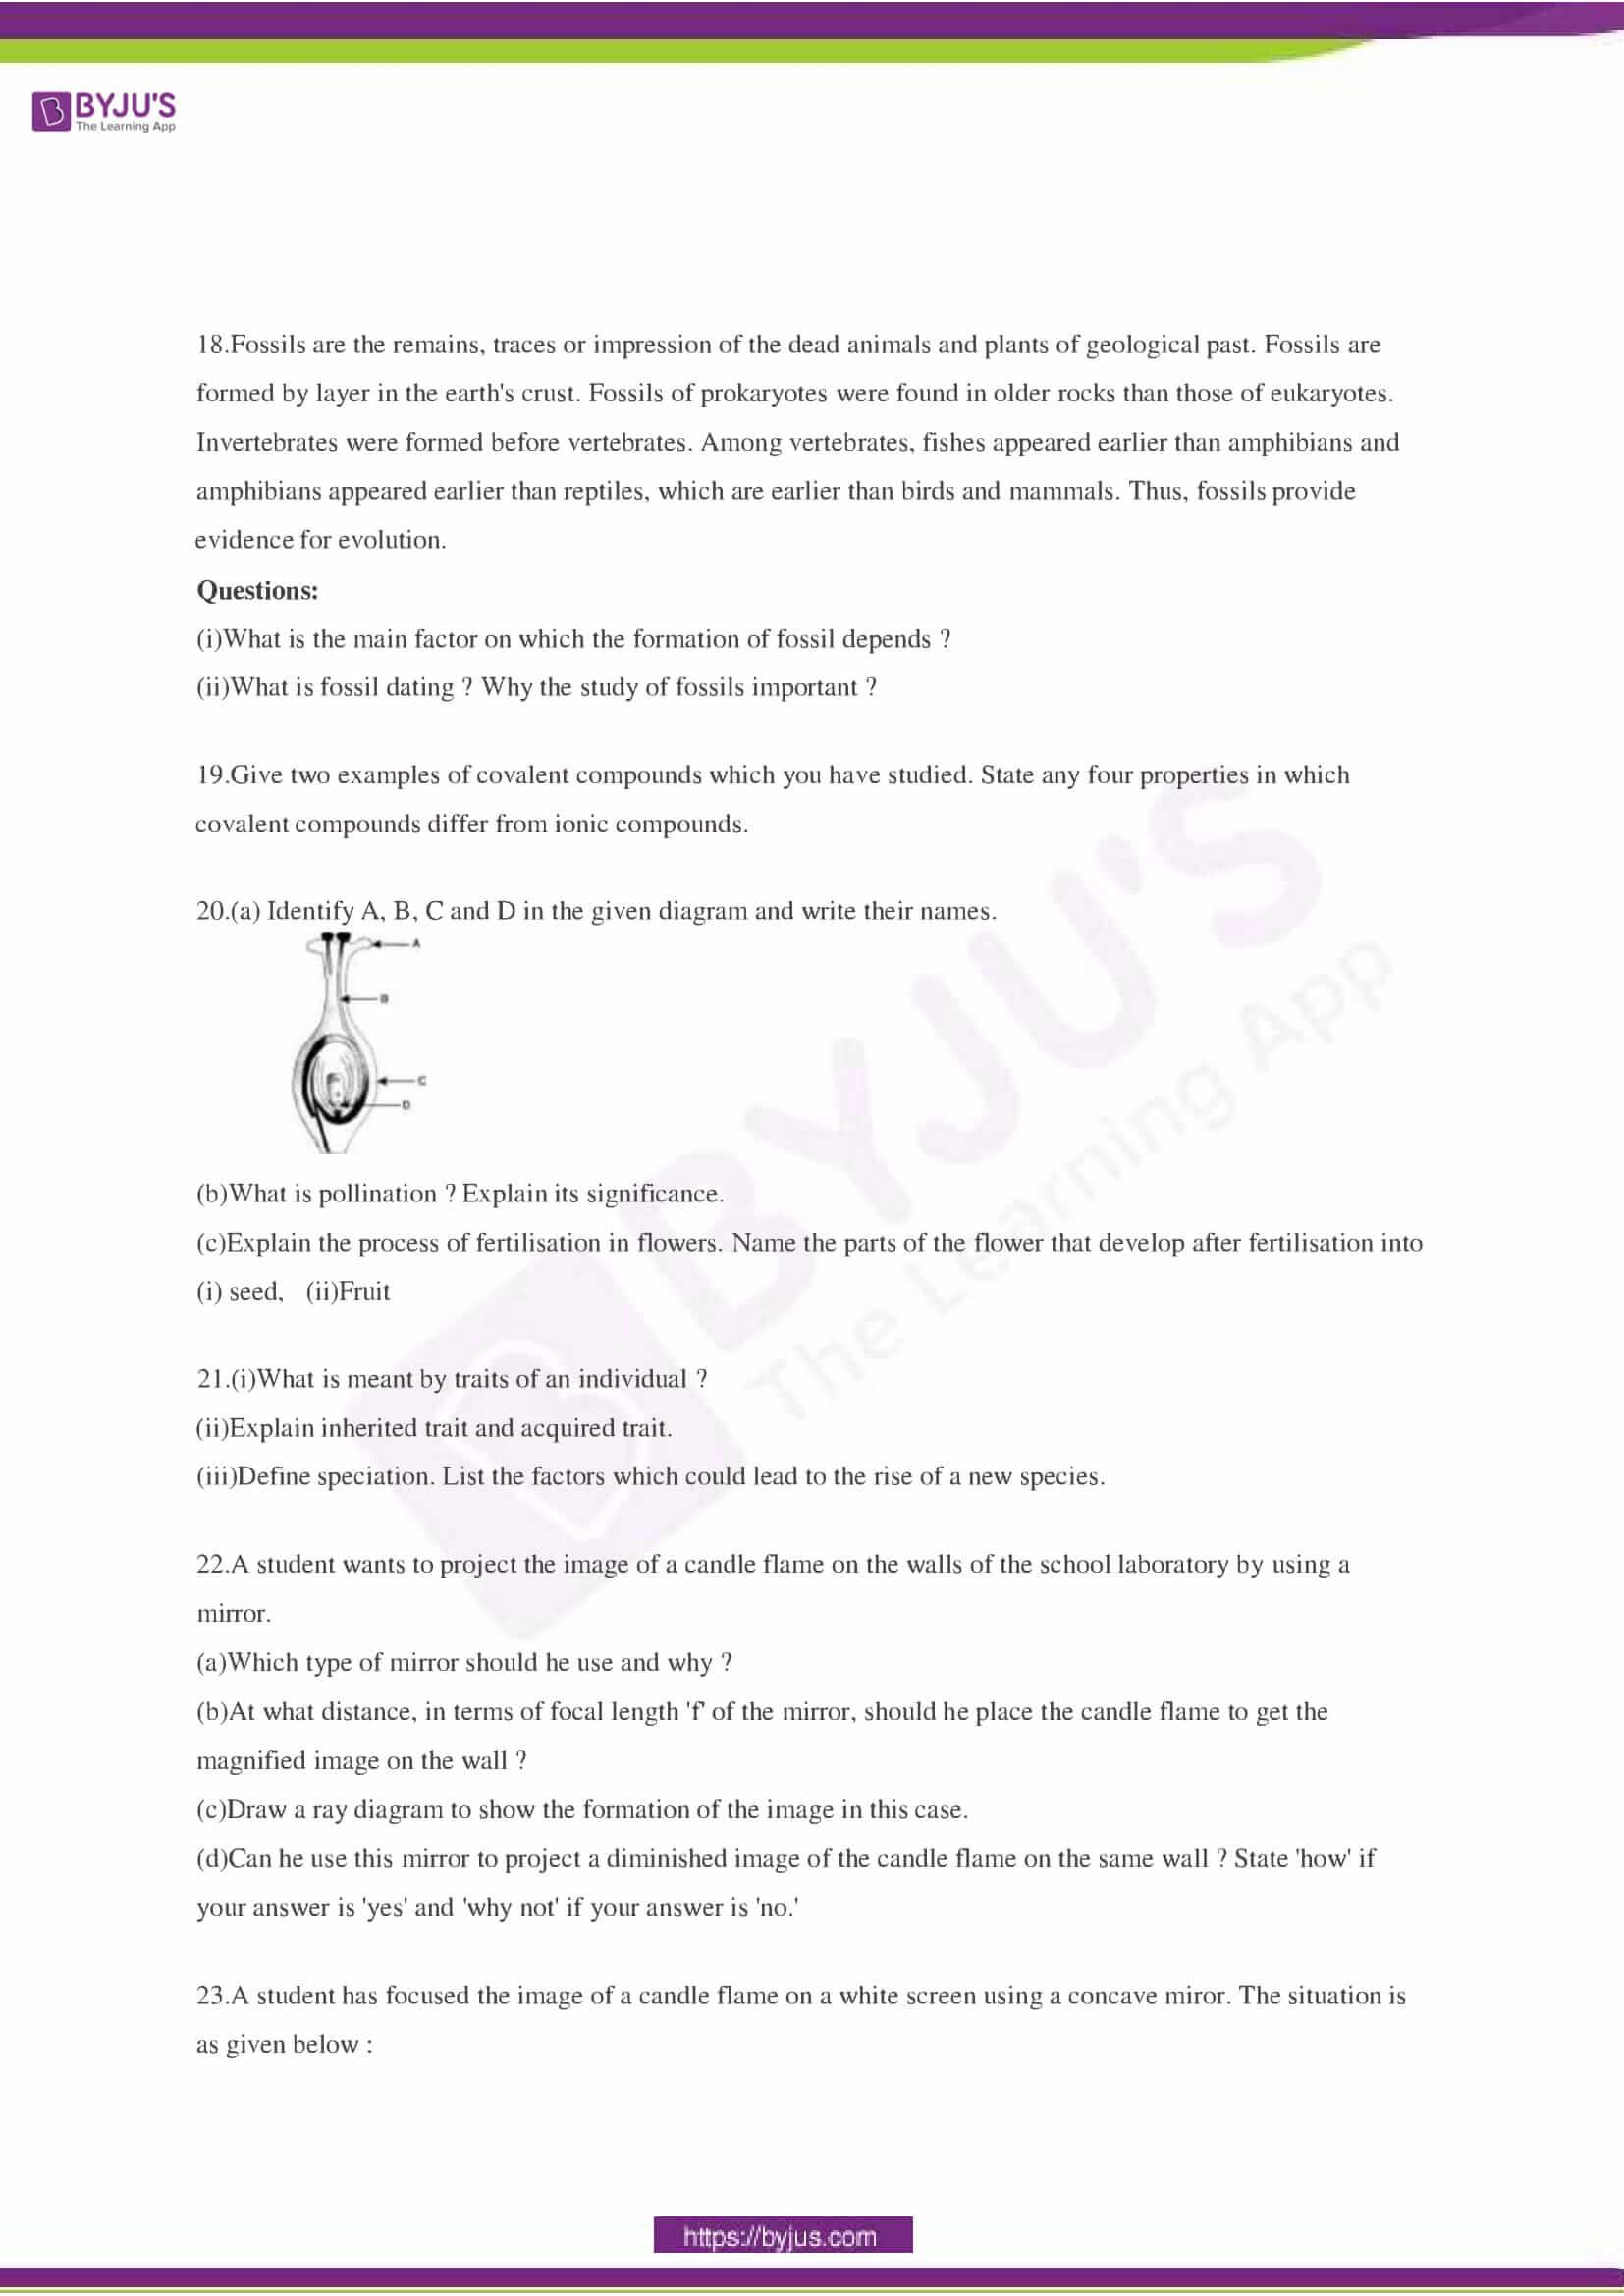 CBSE Class 10 Science Sample Paper Set 3-3